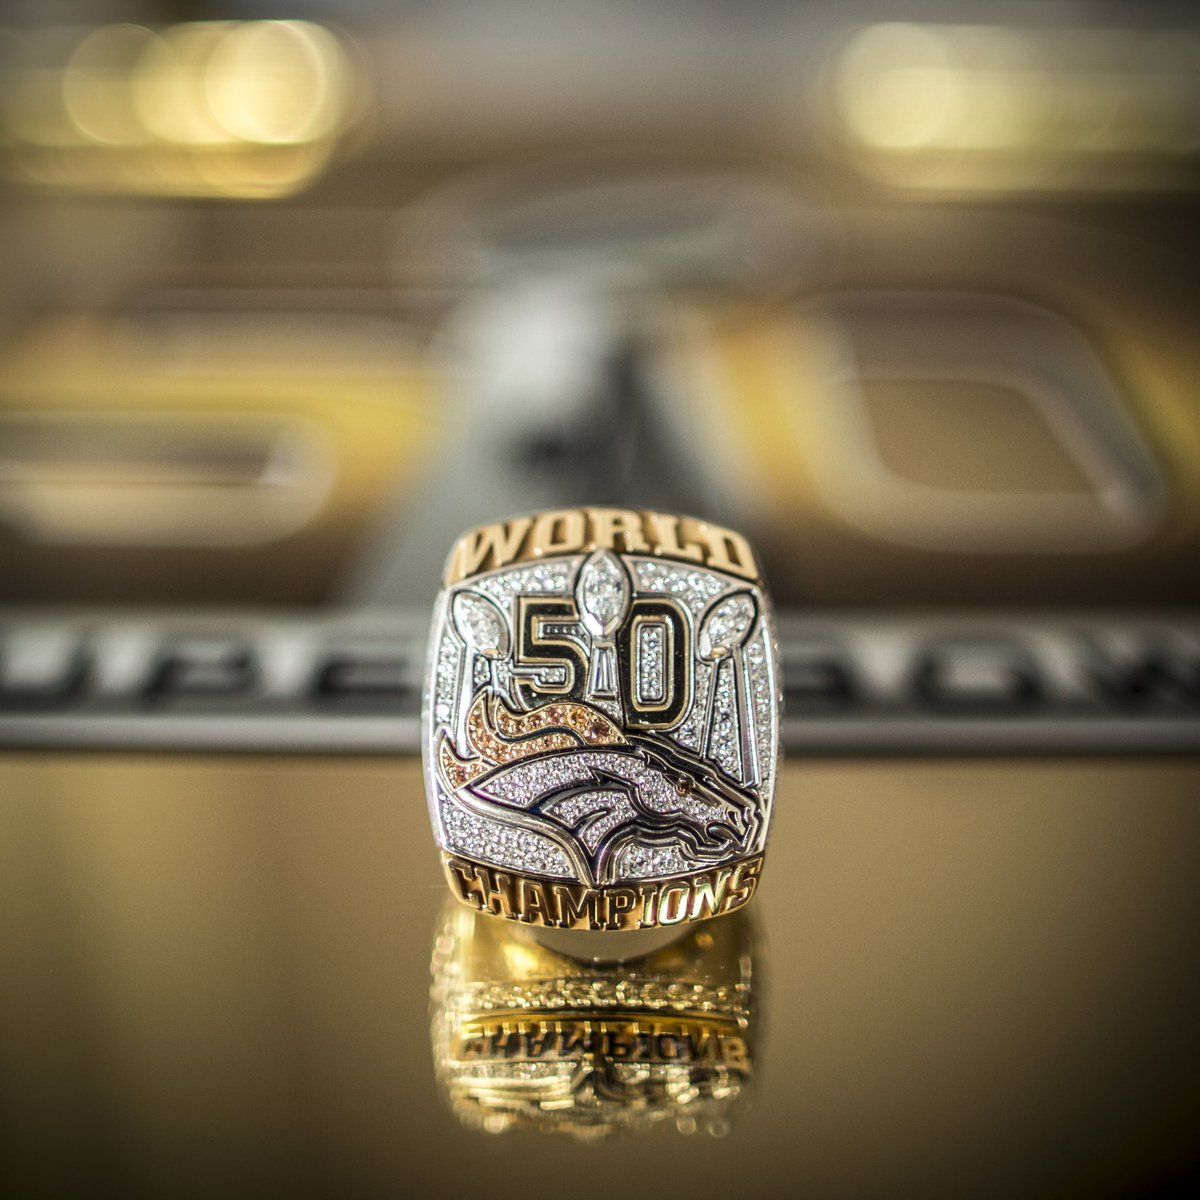 Super Bowl Champions of the World, Craig. https://t.co/JbLwaXtZnn